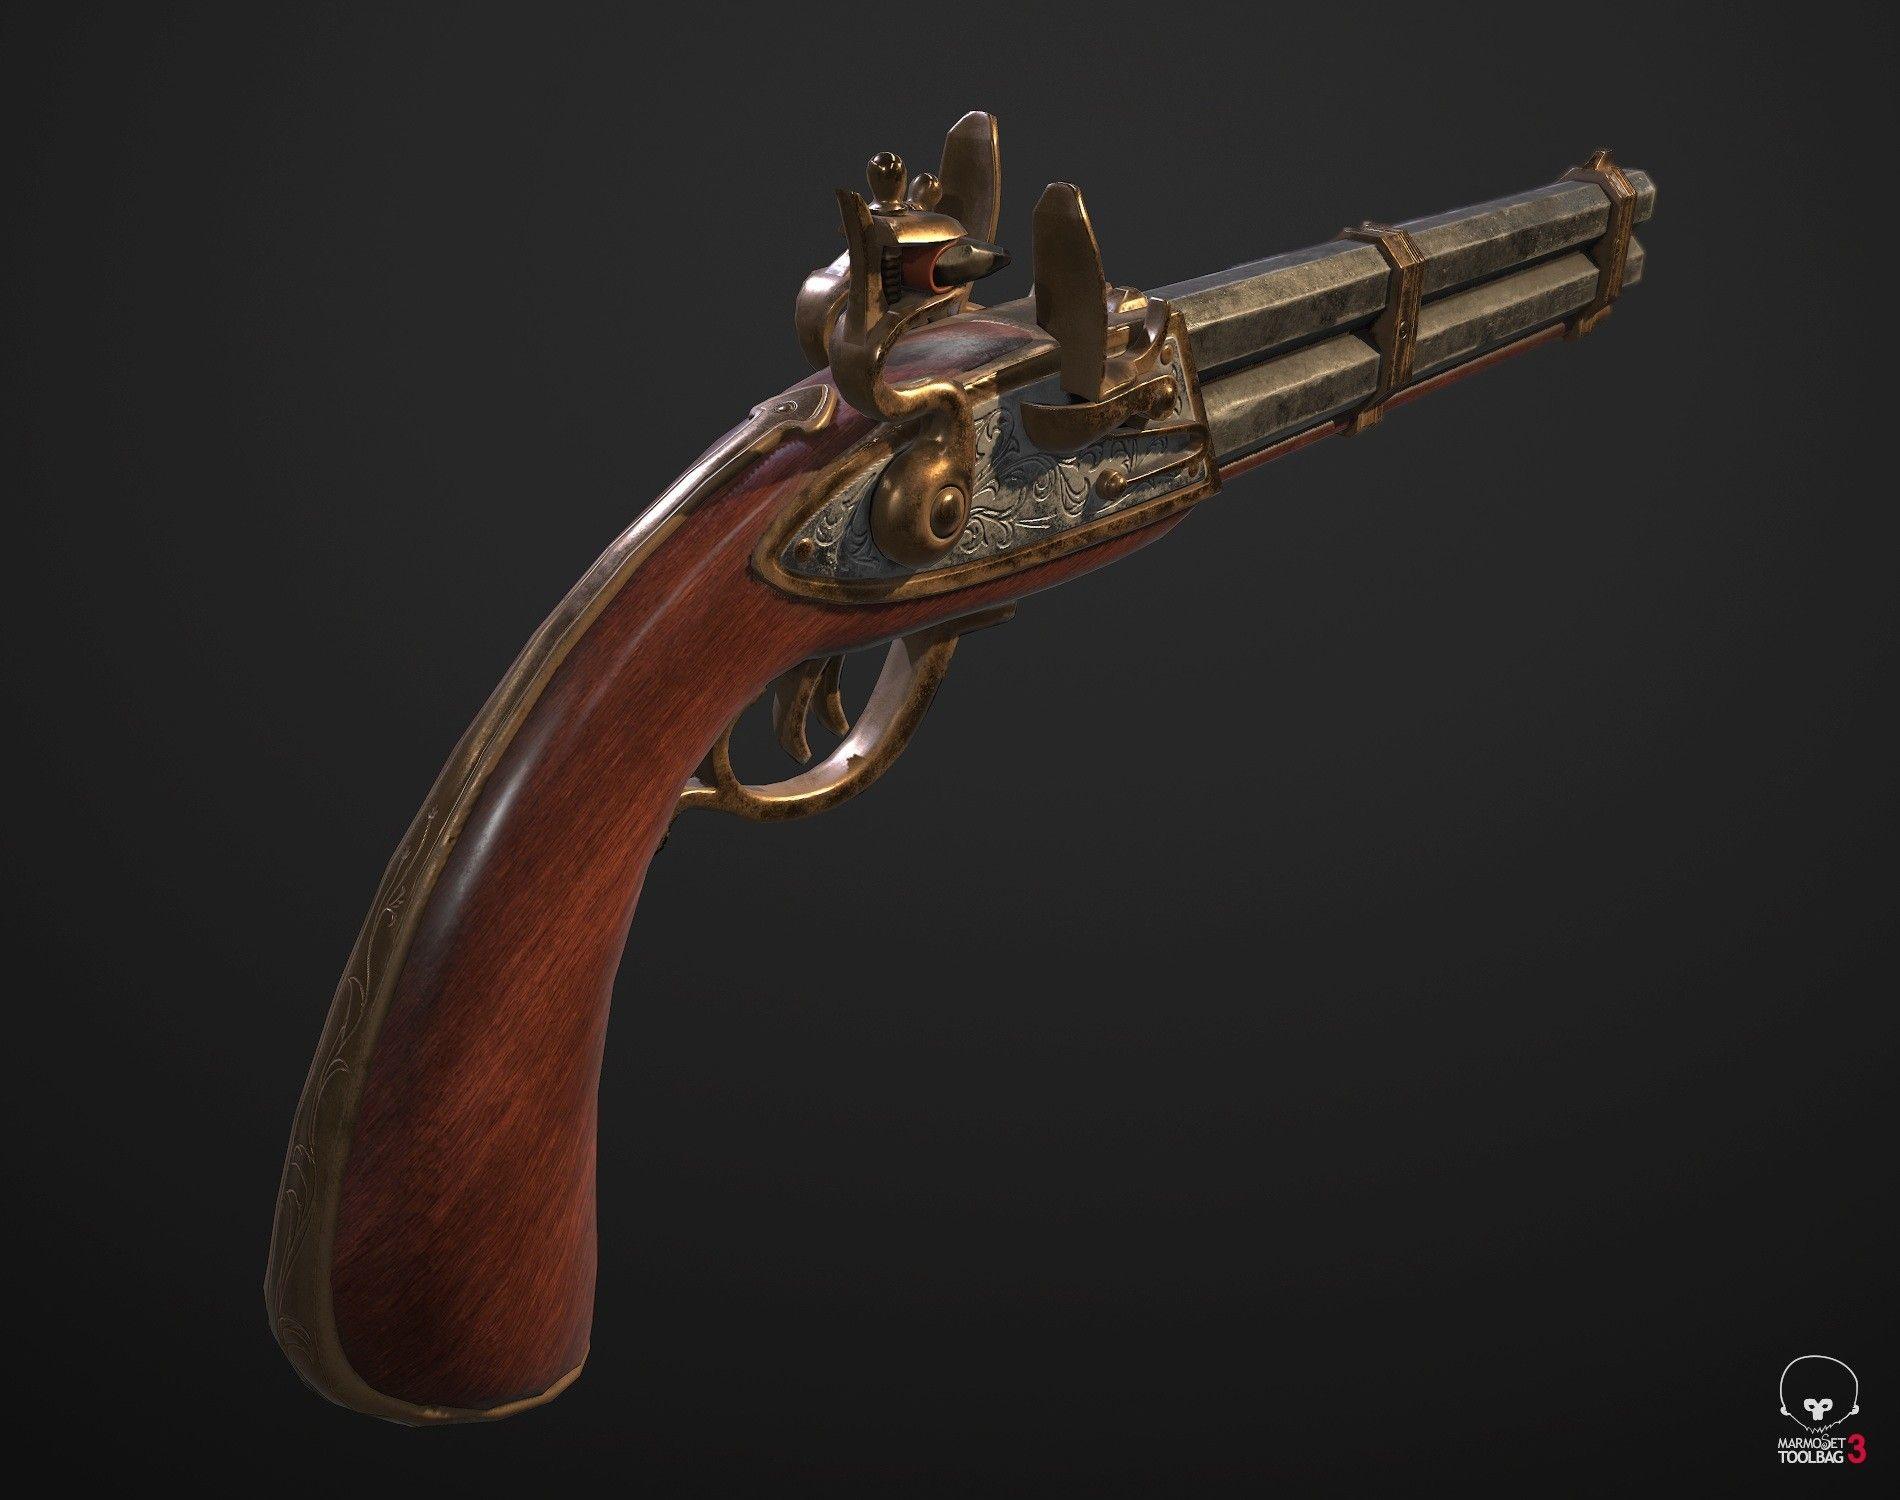 ArtStation - Double-barrel flint pistol, Anton Kalimullin